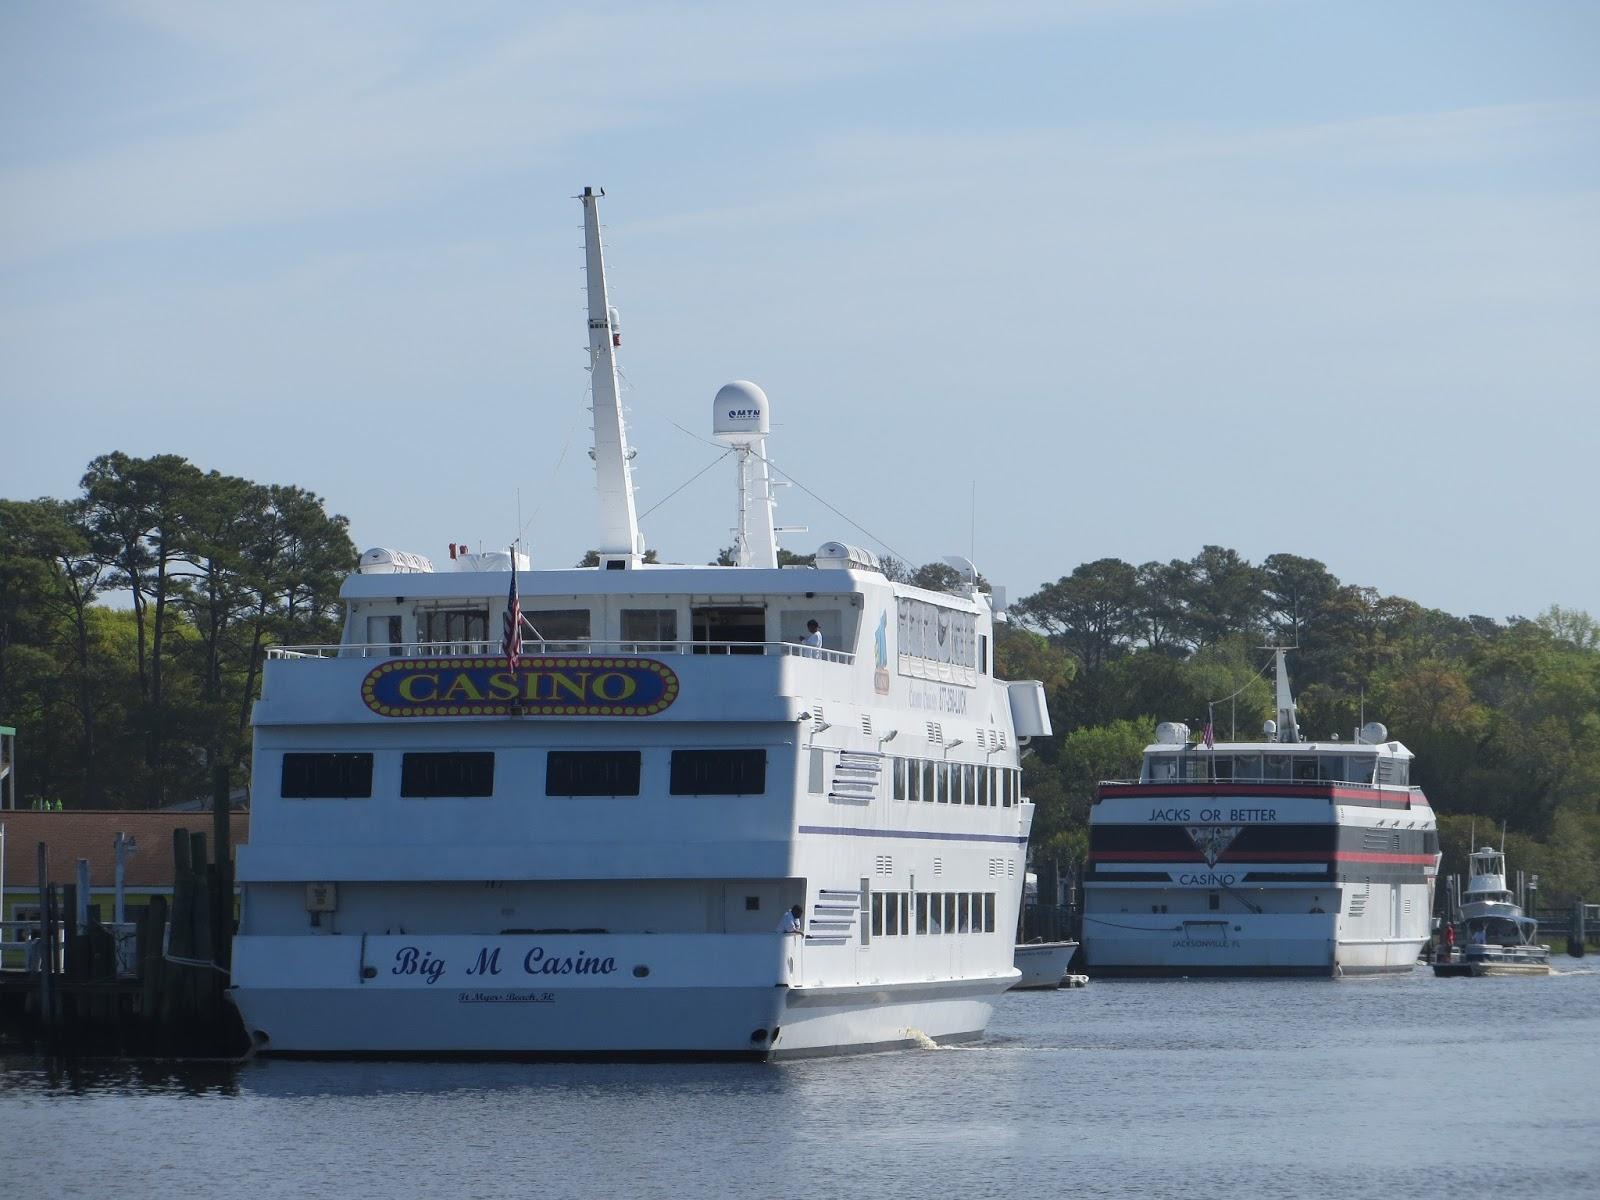 Casino Boat Myrtle Beach Nc